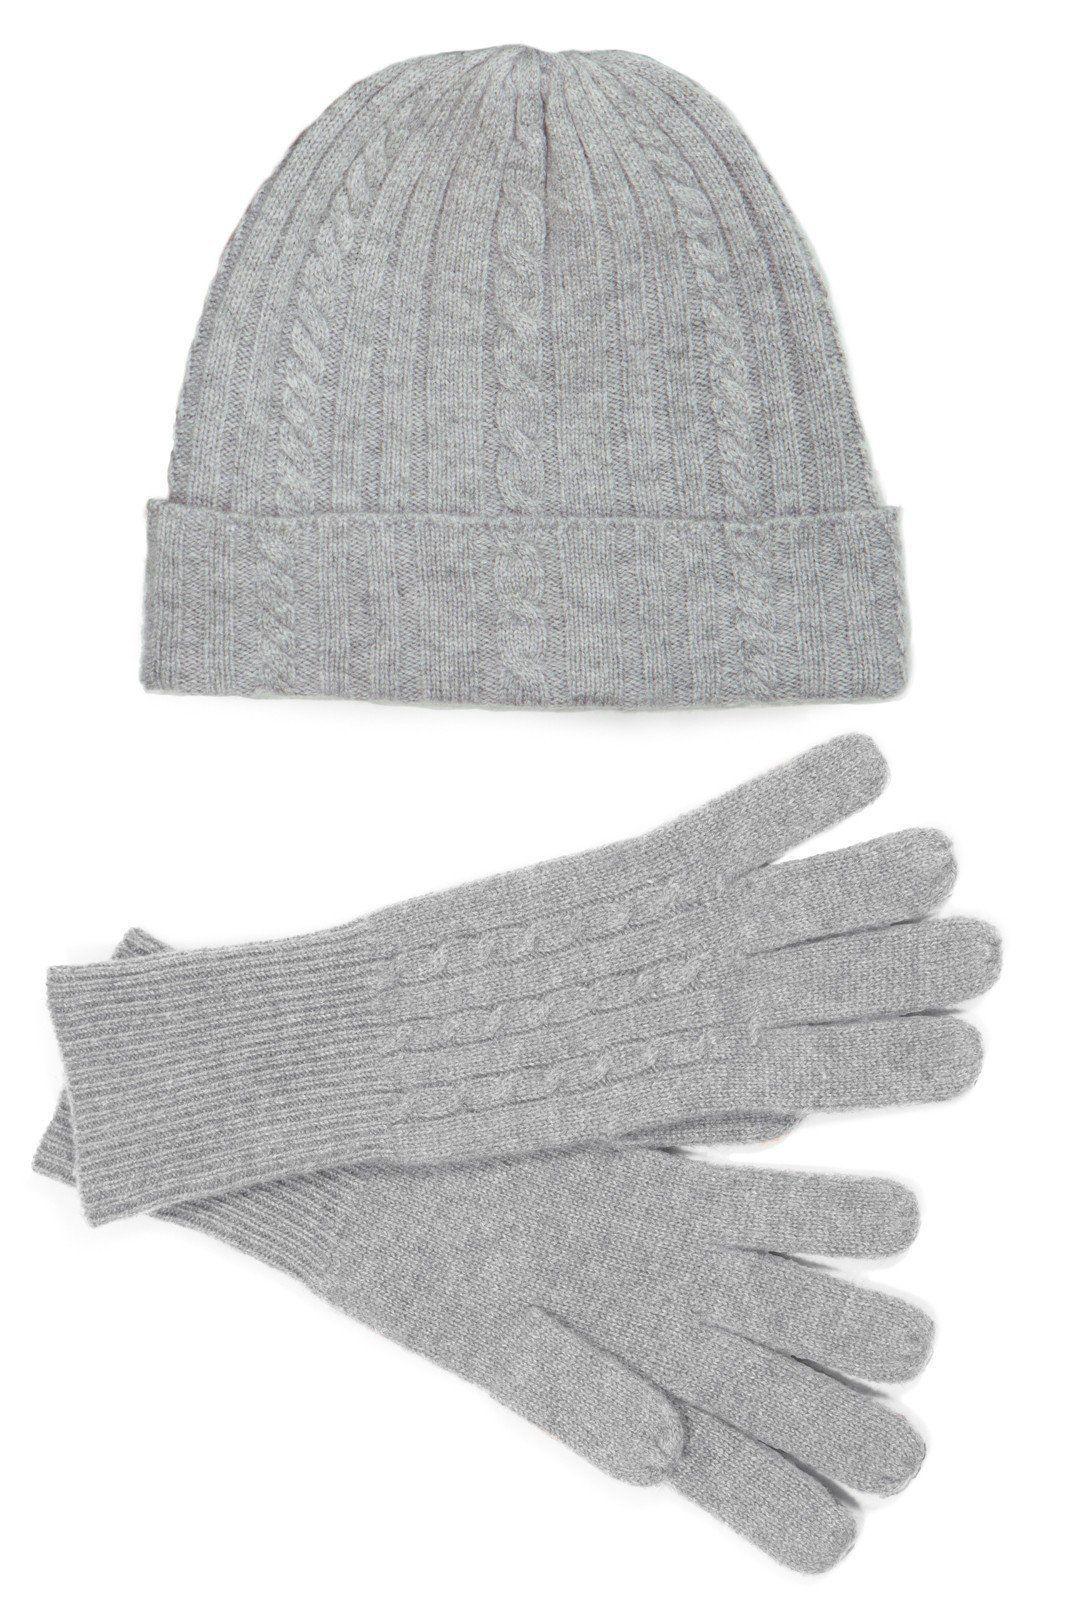 84e43c7c074 Women s 100% Pure Cashmere Hat   Glove Set with Gift Box